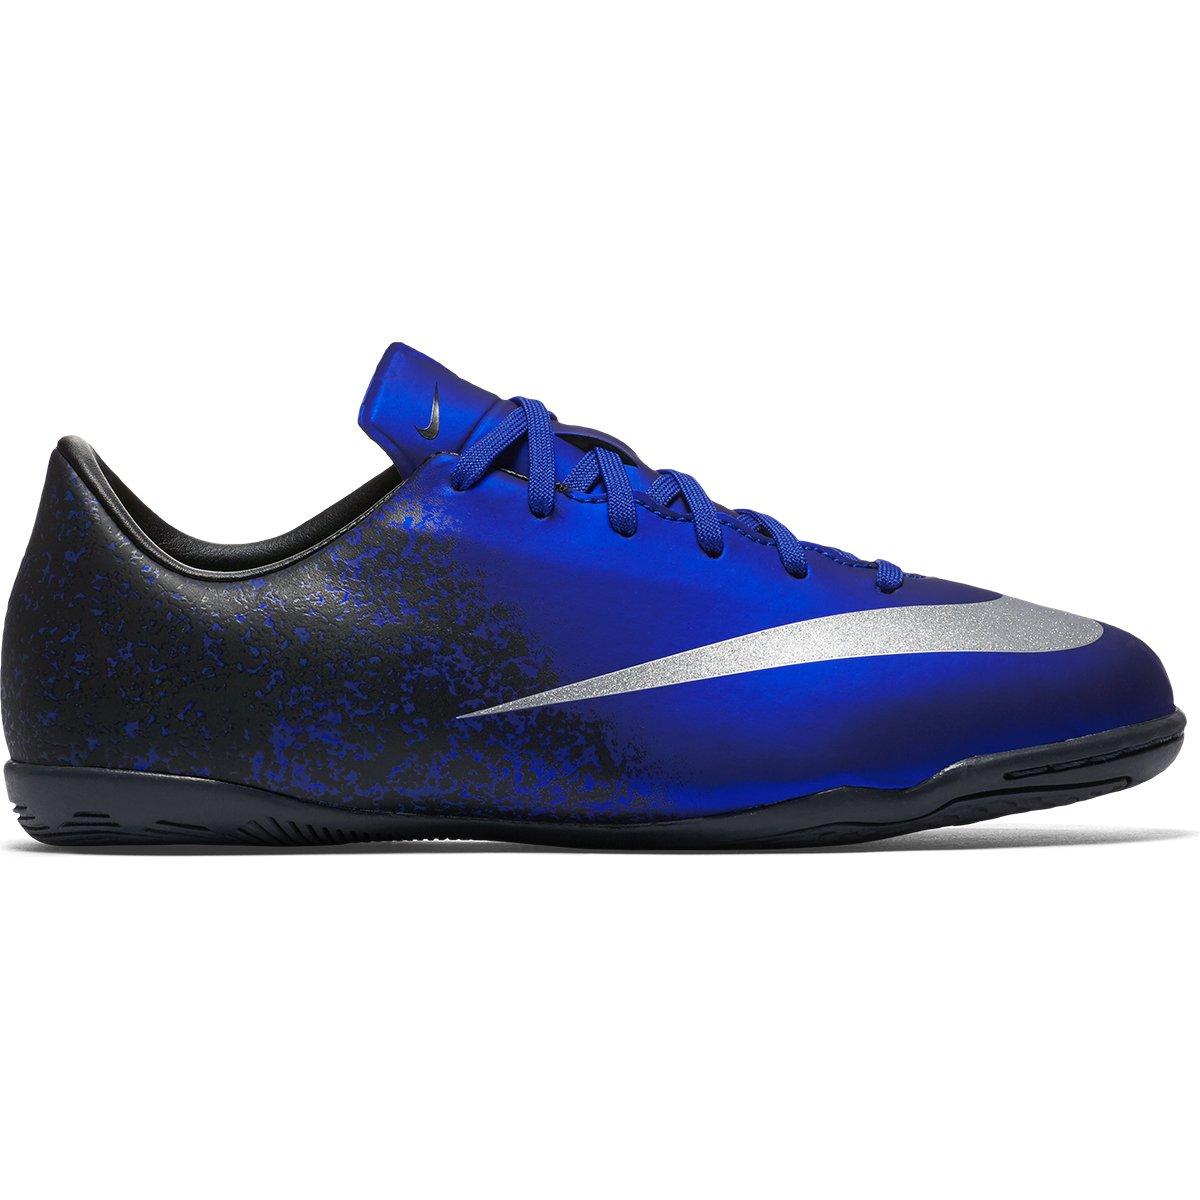 a42a0c868b361 Chuteira Futsal Infantil Nike Mercurial Victory 5 CR7 IC - Compre Agora